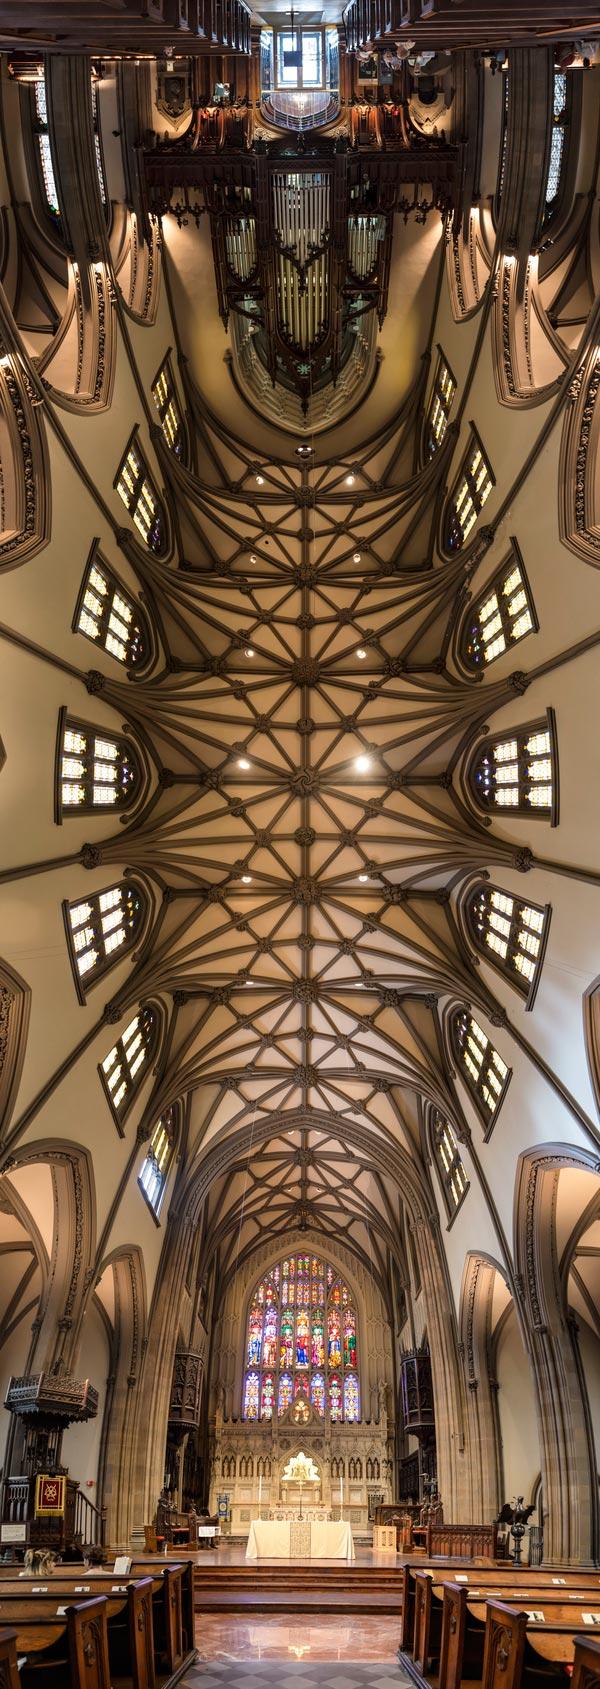 vertical panoramas of church ceilings 3 Amazing Vertical Panoramas of Church Ceilings